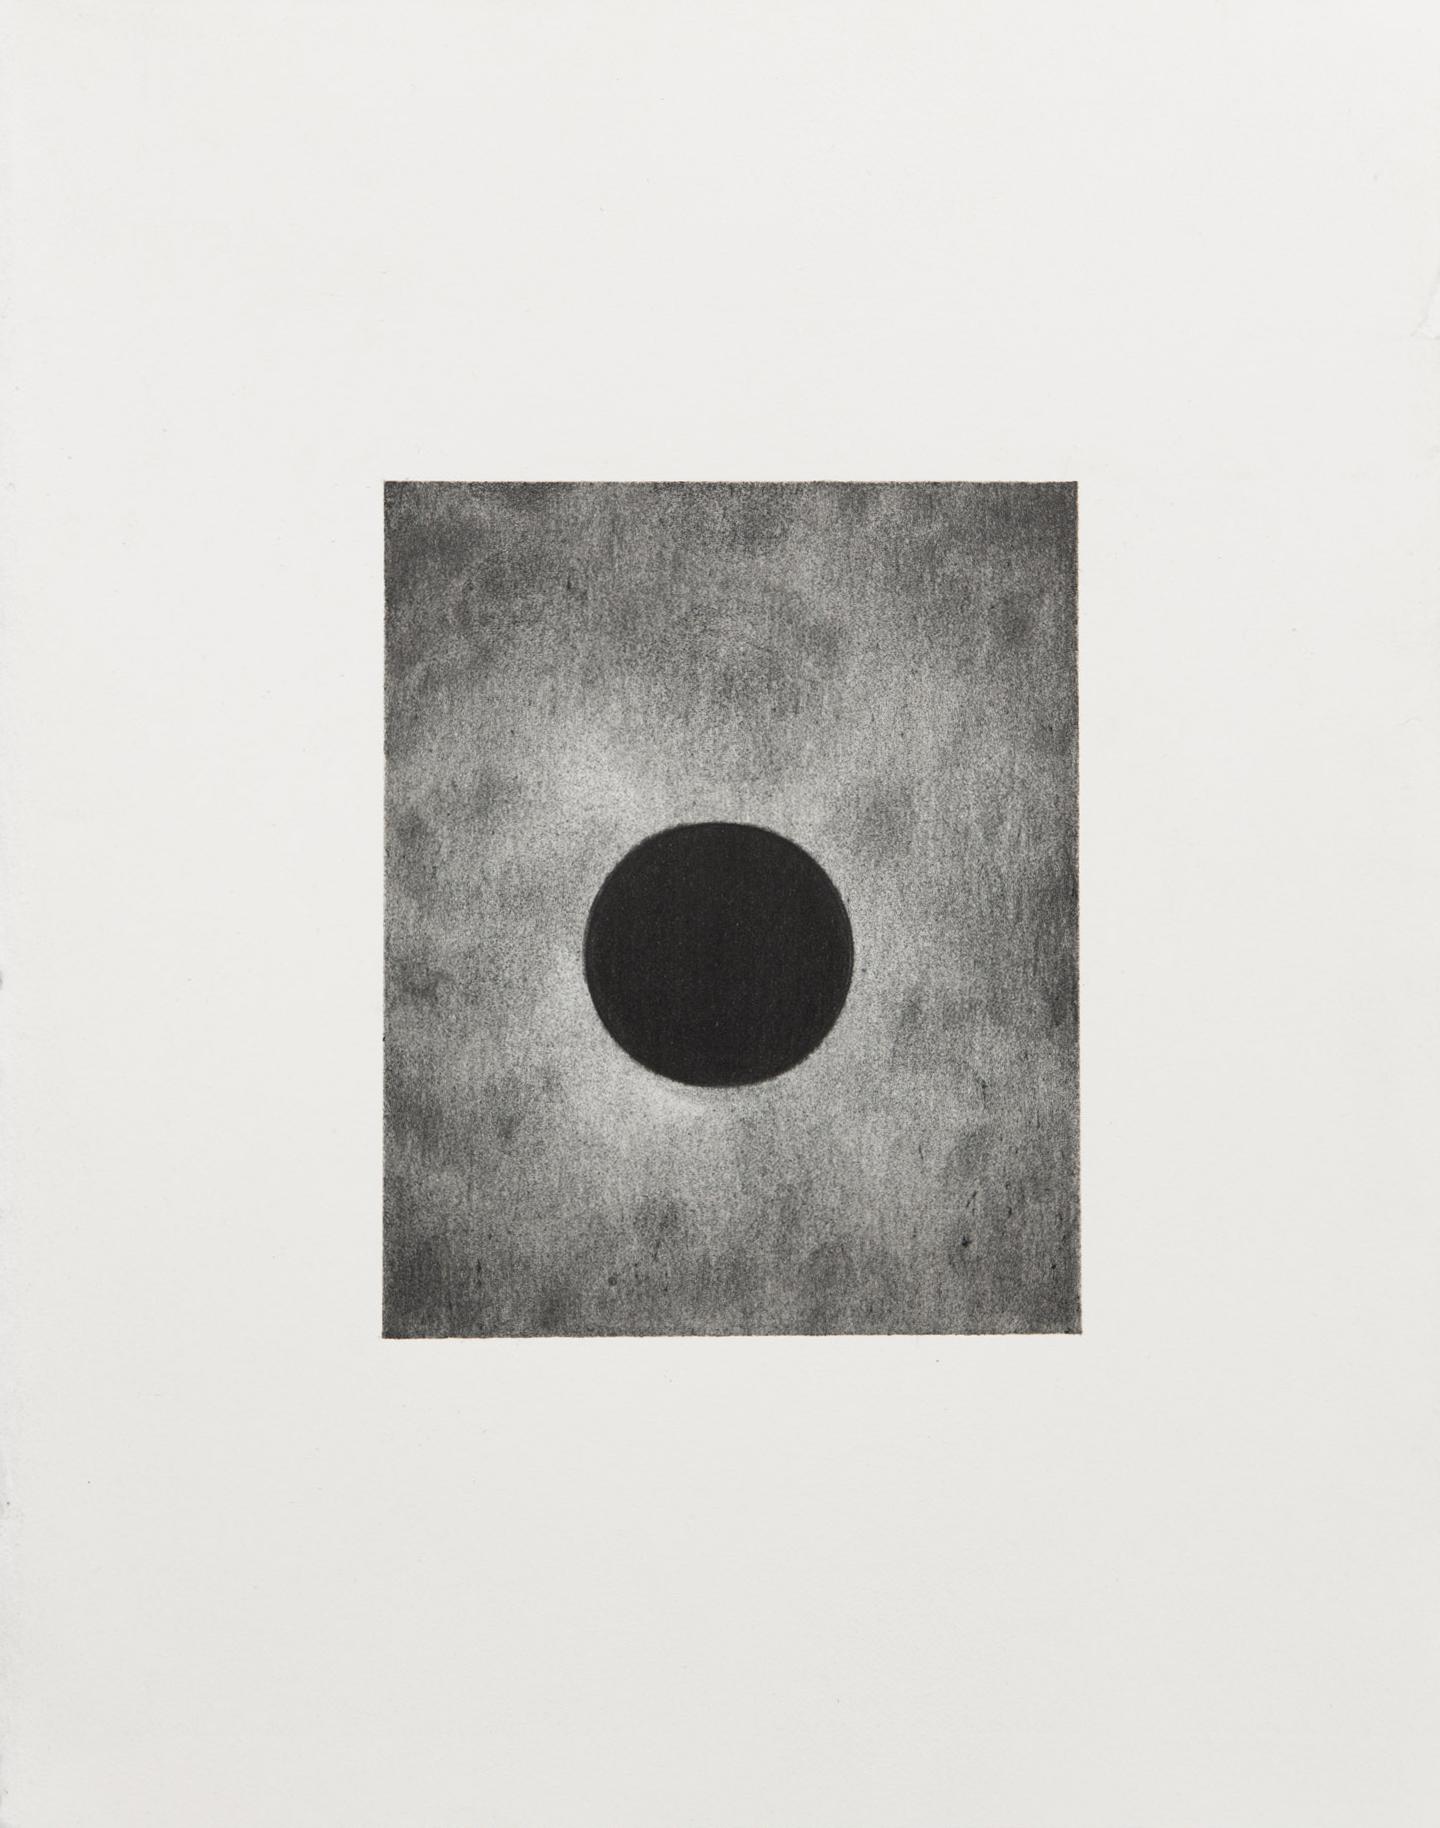 "Carl Trahan,  O   1,  2018, graphite on paper, 5"" x 4"" (12 x 10 cm)"